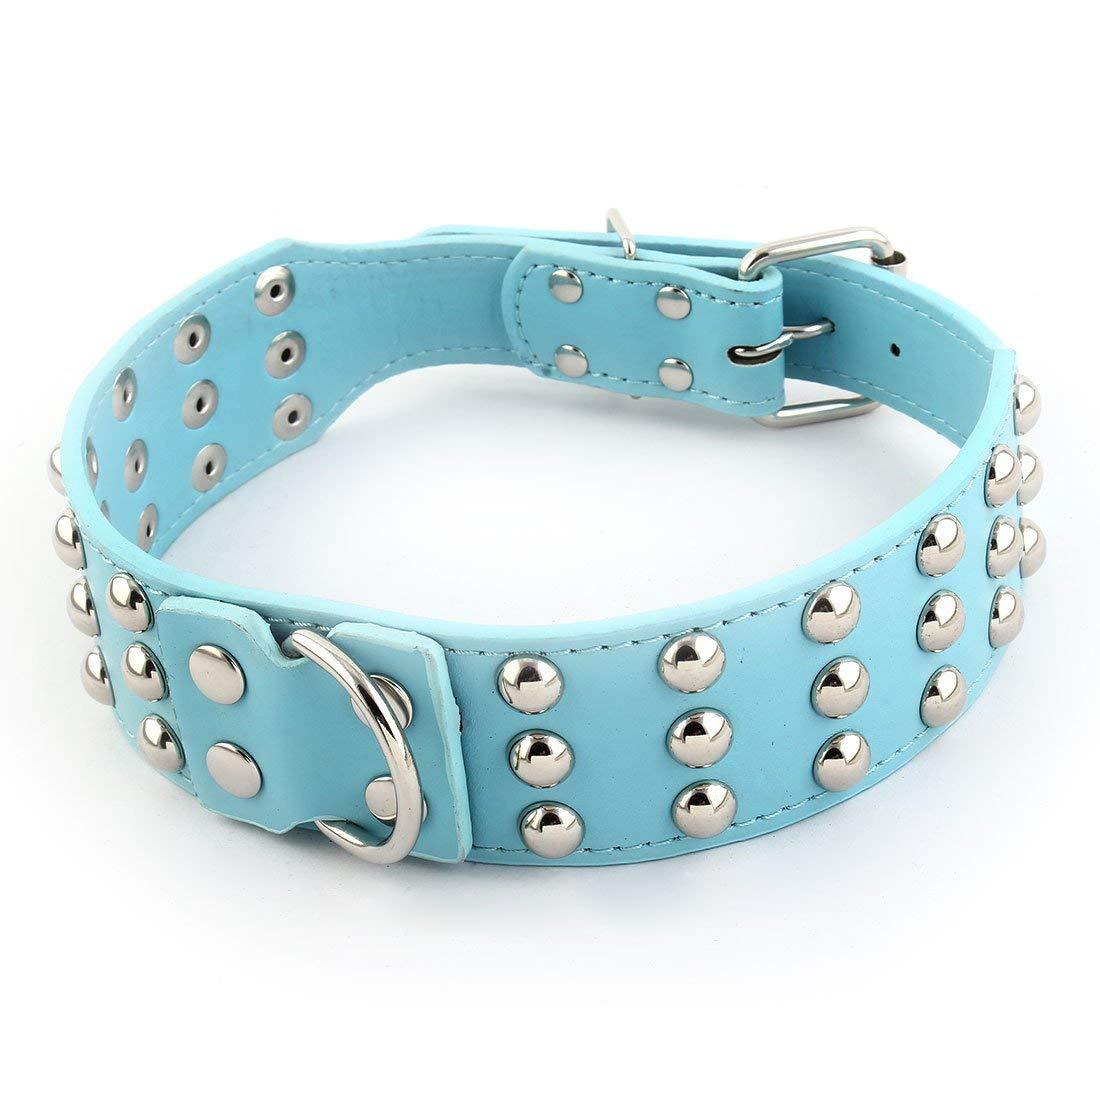 Faux Leather Pet Dog Studded Rivet Buckle Adjustable Neck Collar L Size Sky bluee